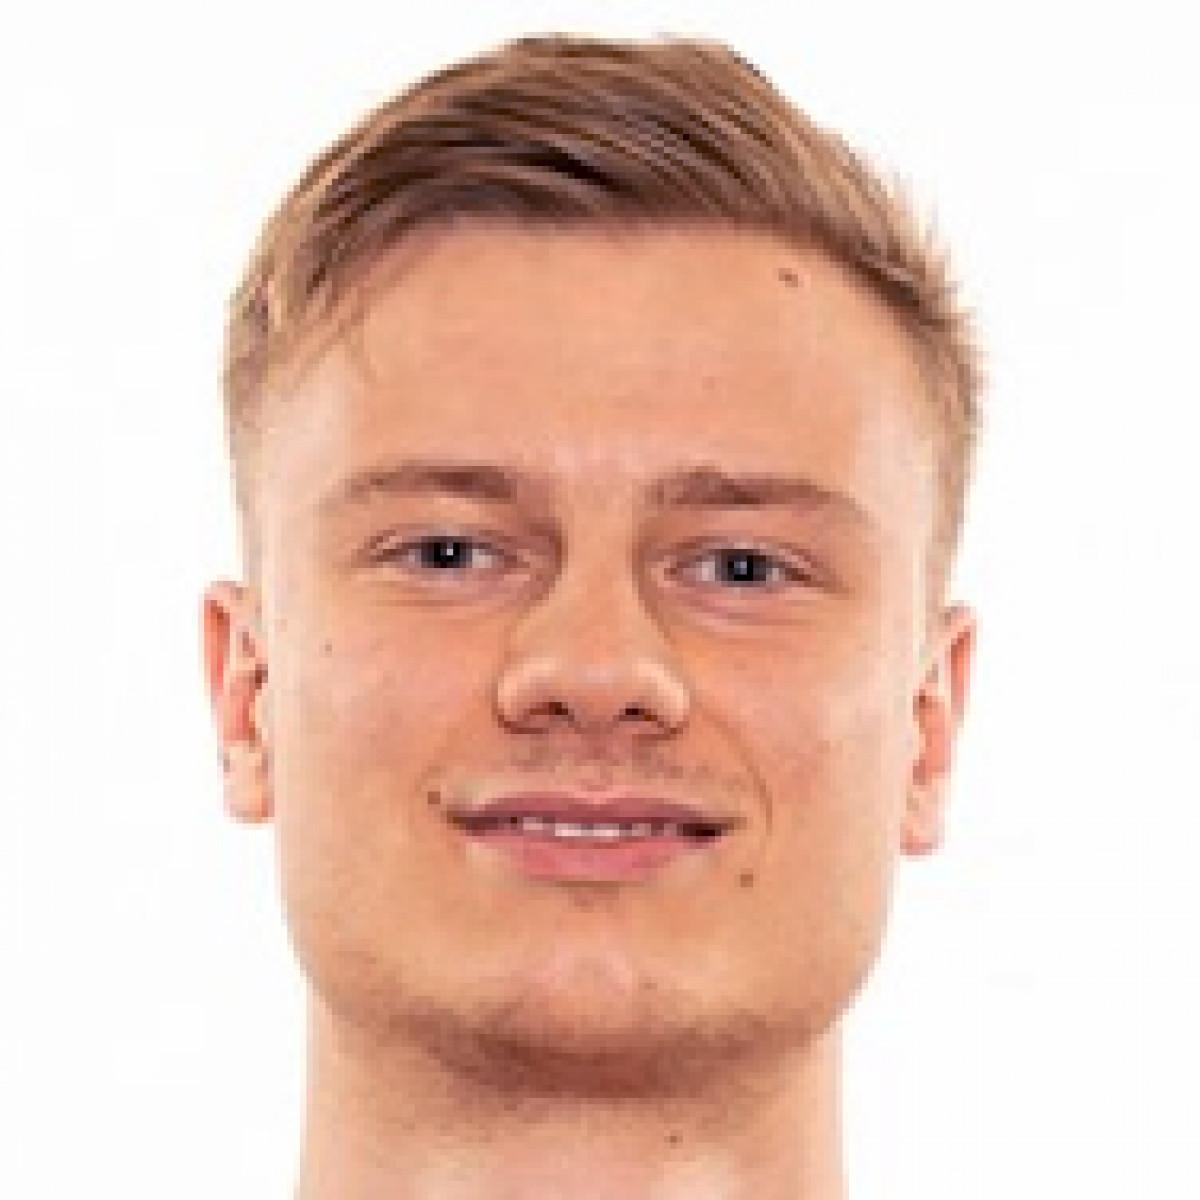 Filip Stryjewski